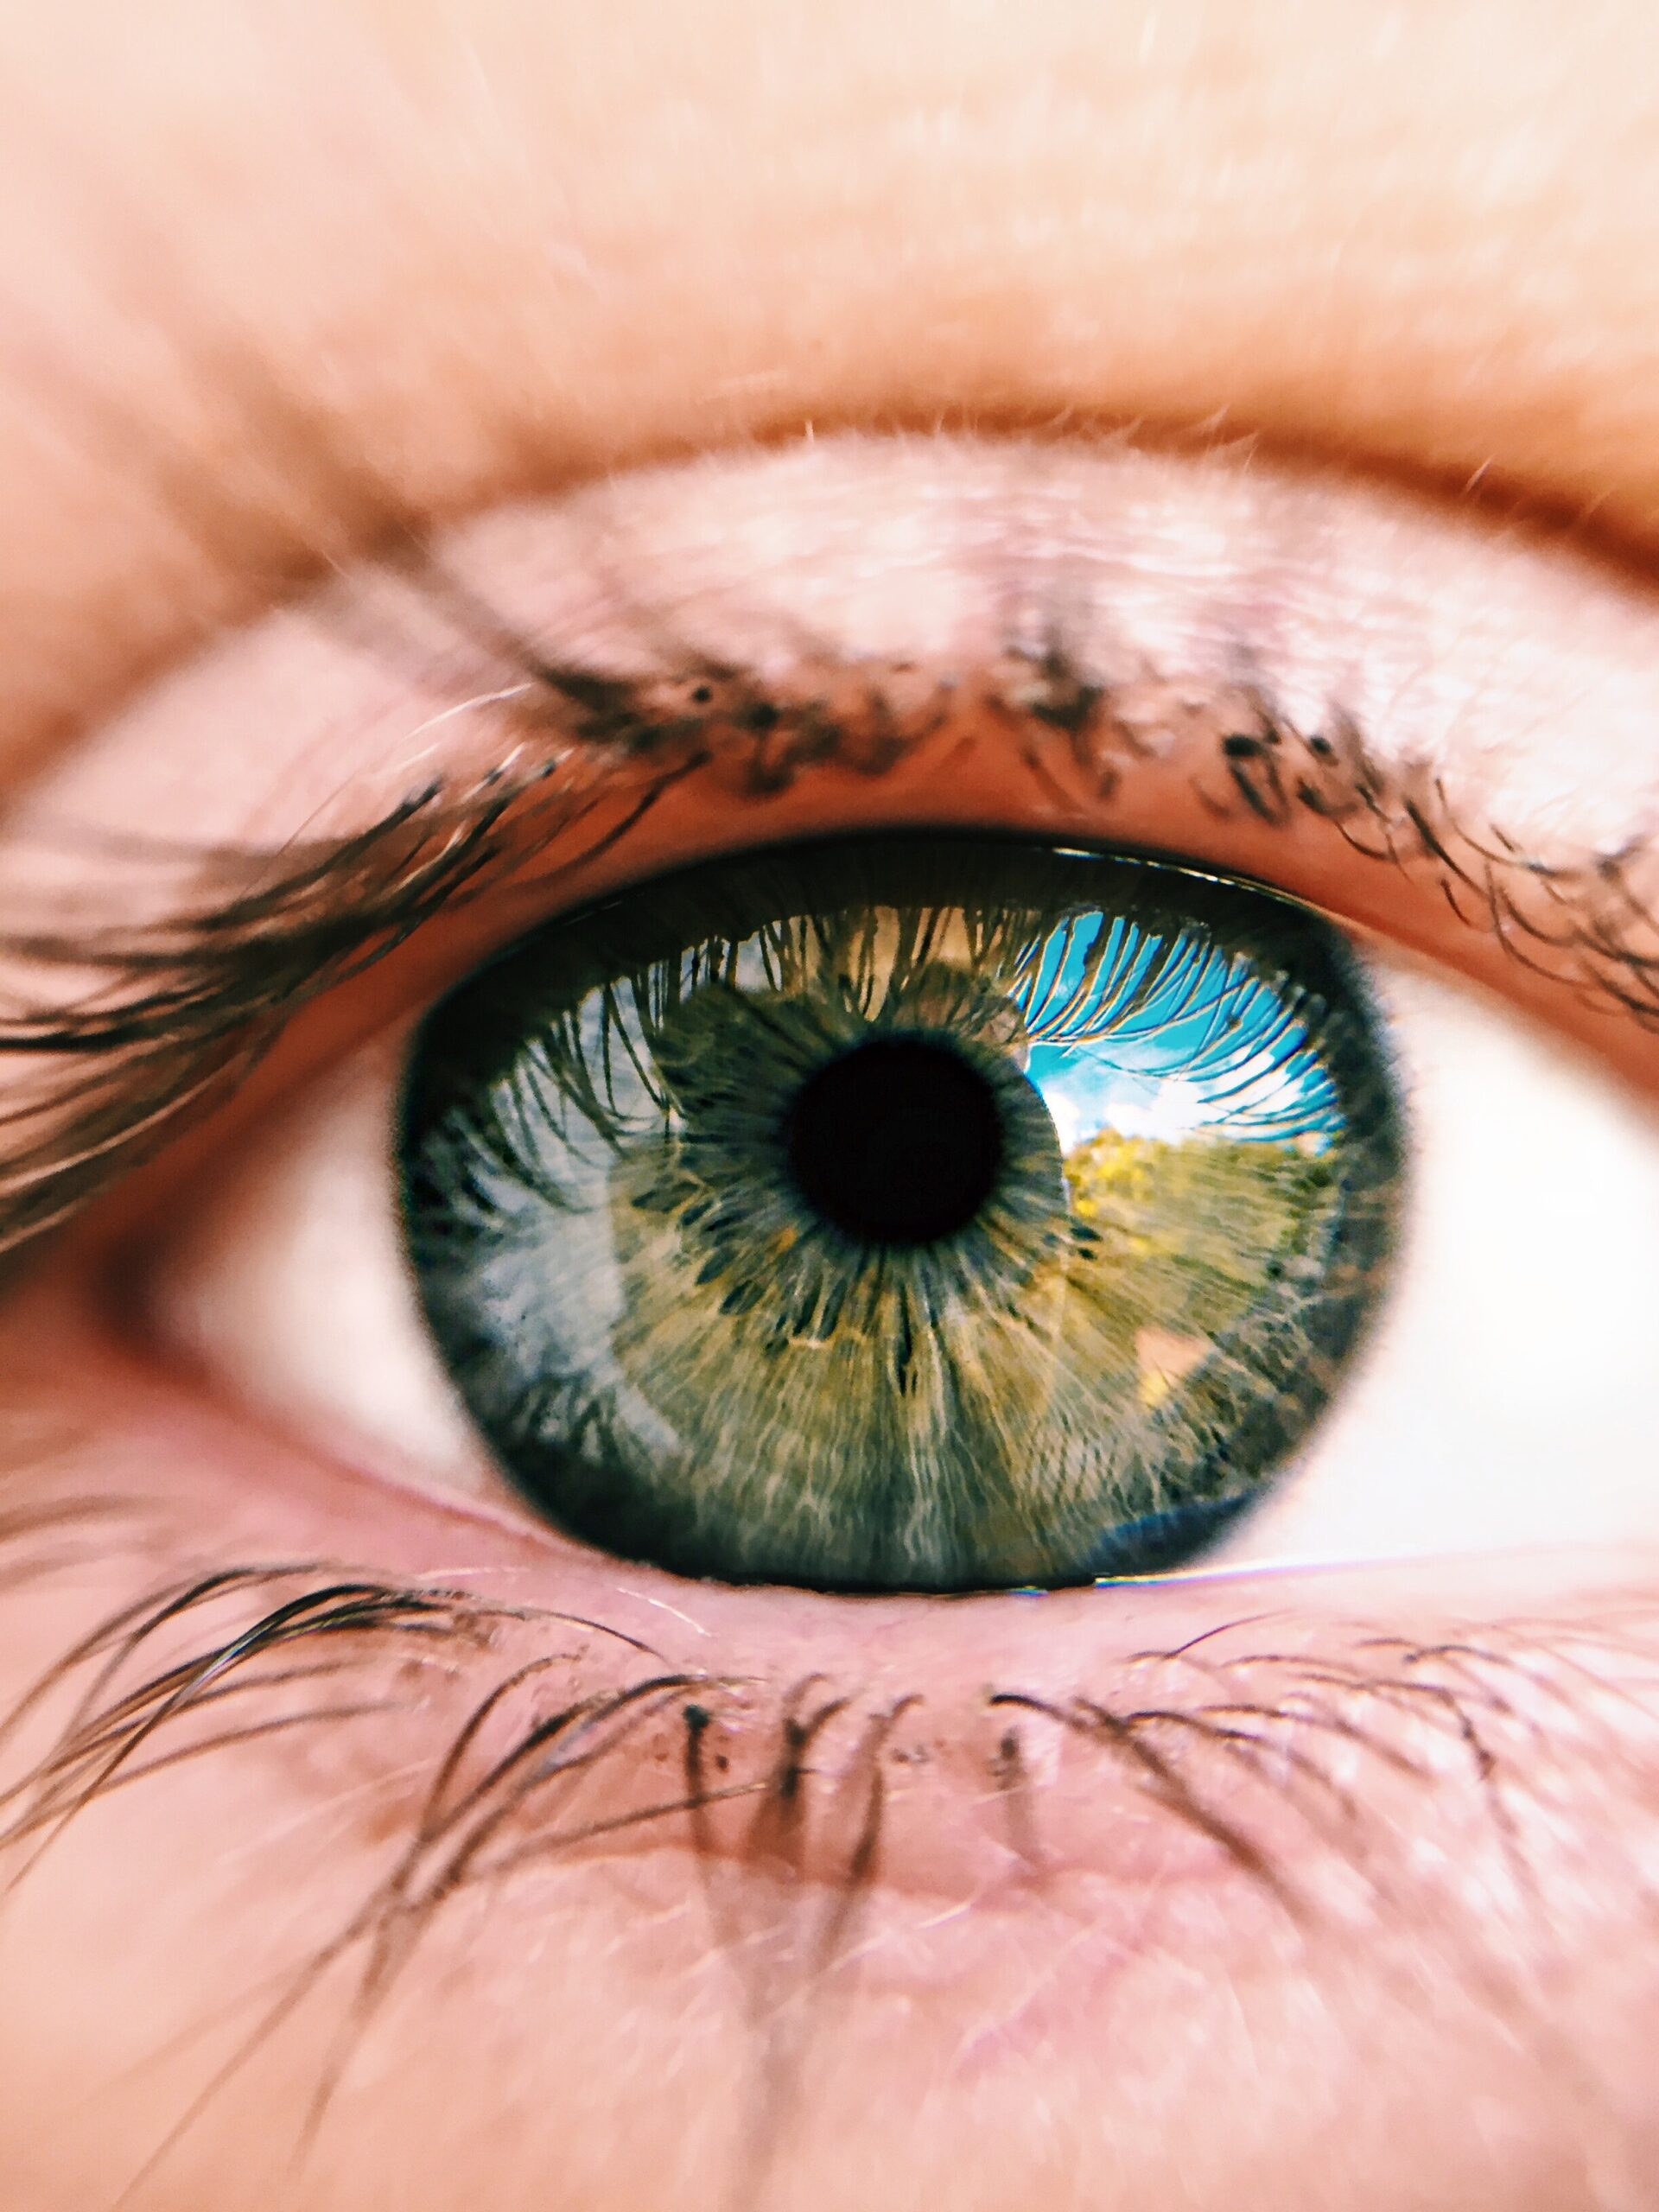 zablude o vidu